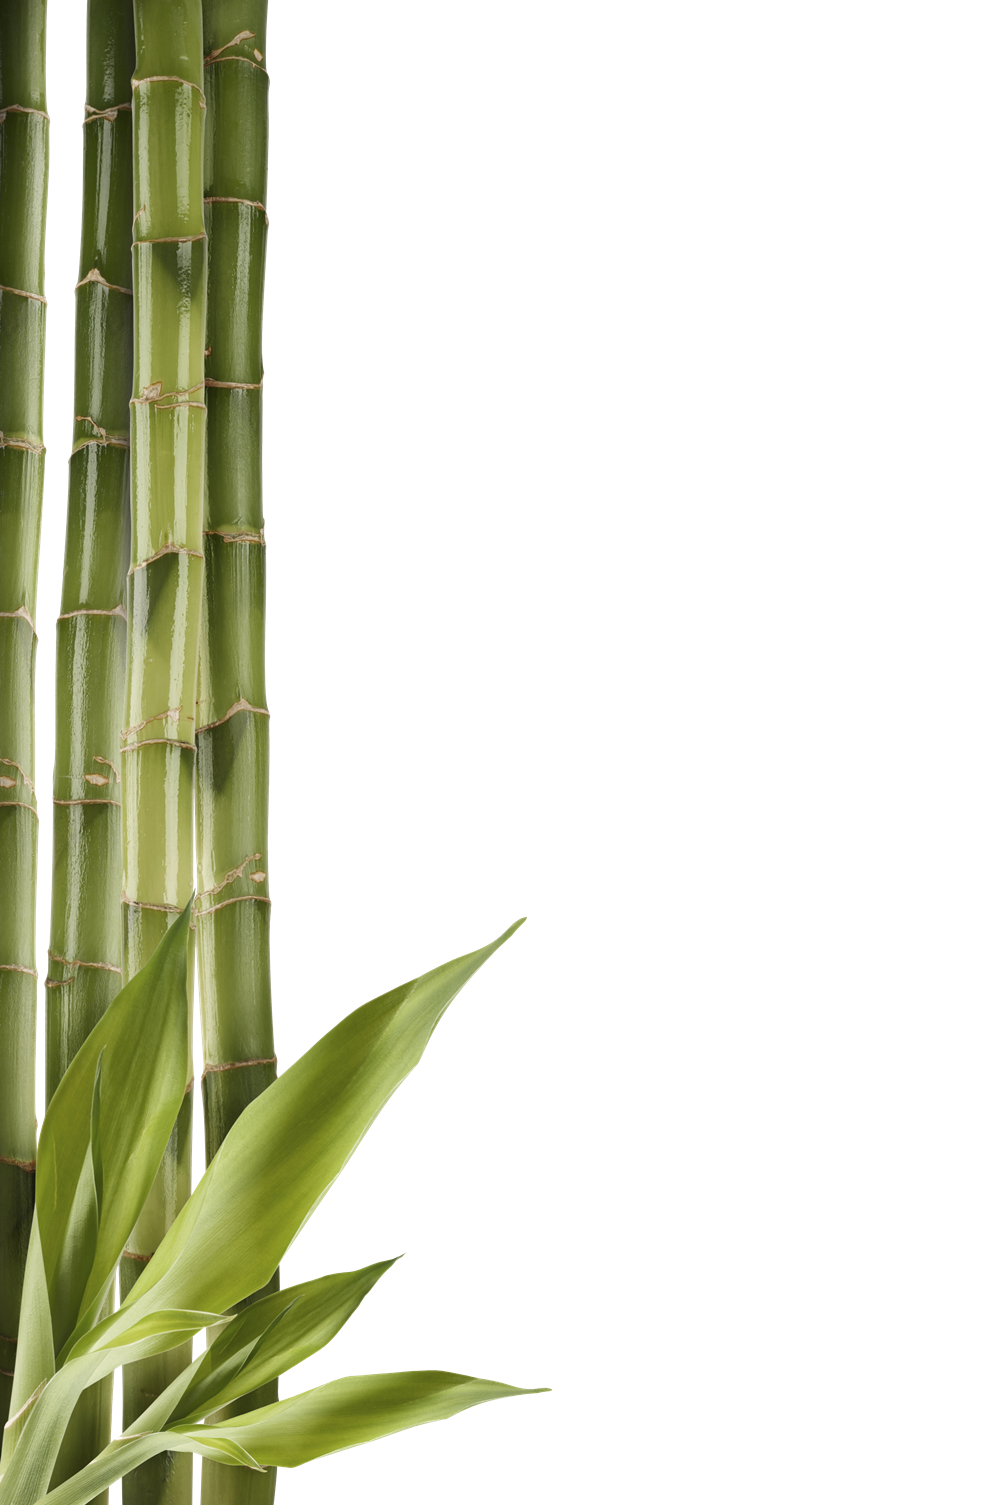 Bamboo Png image #40463